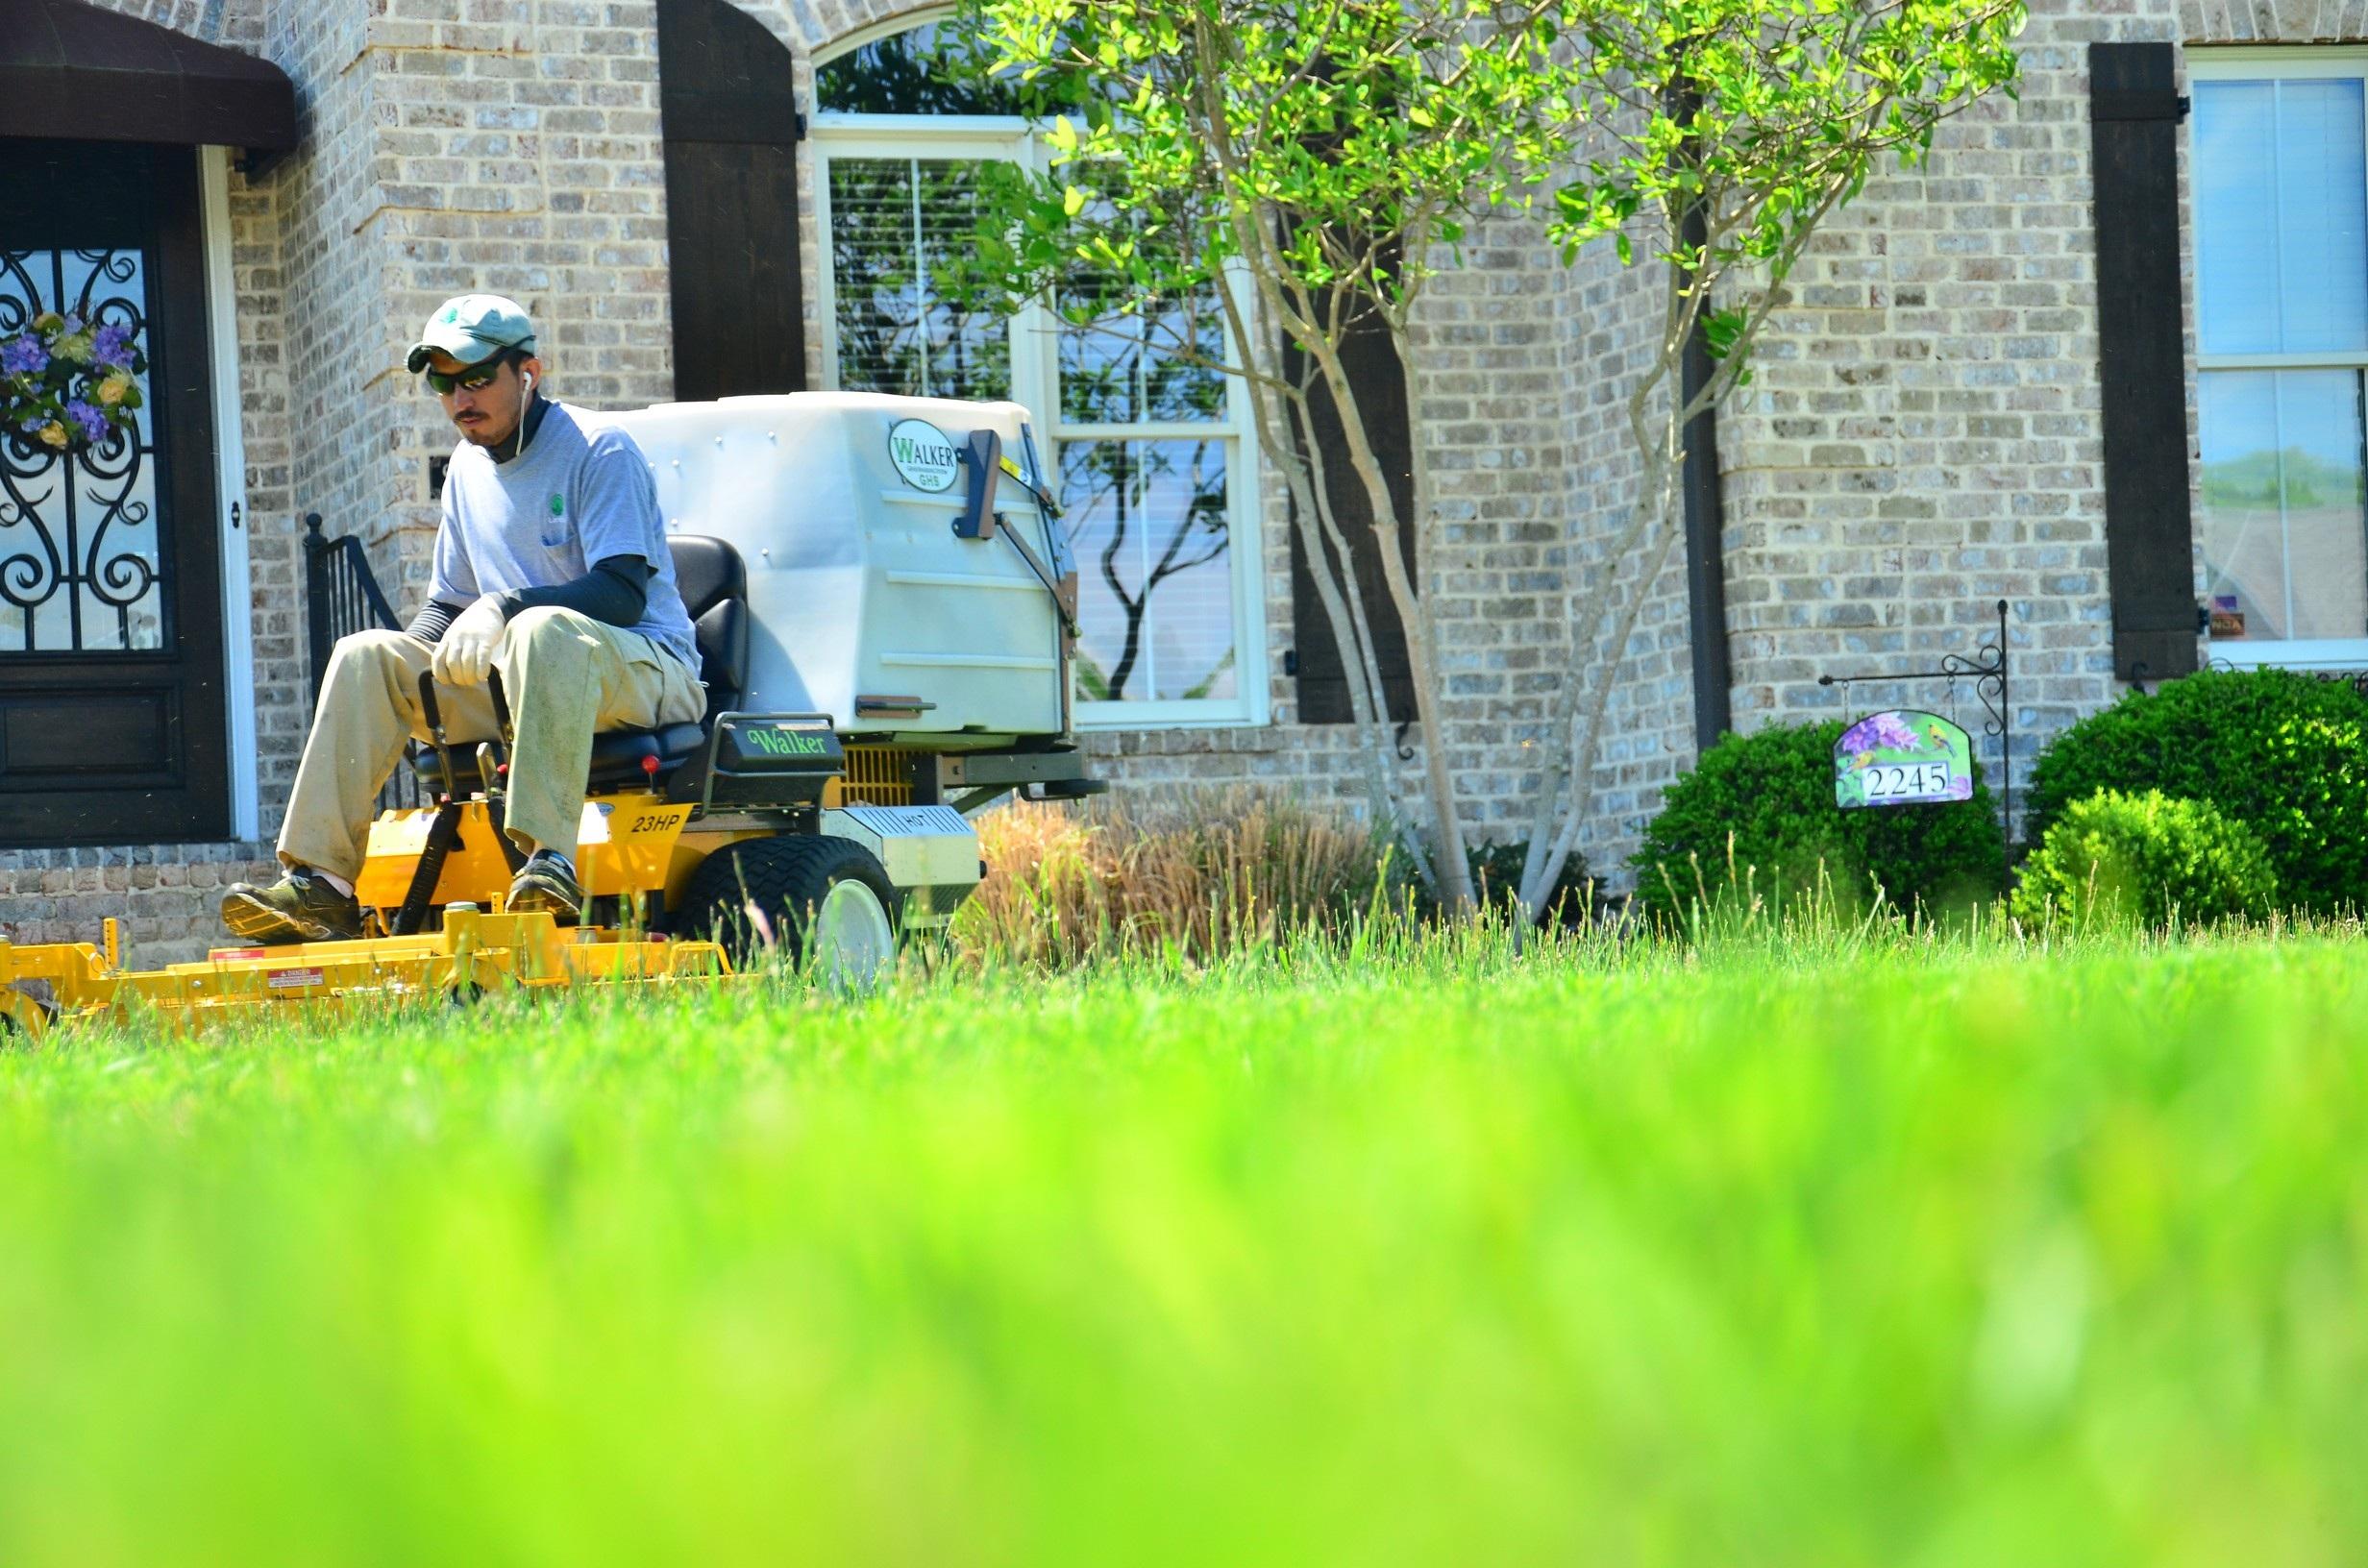 Elegant Grass Lawn Flower Home Green Backyard Garden Yard Lawn Mowing Lawn Care  Lawn Maintenance Lawn Services